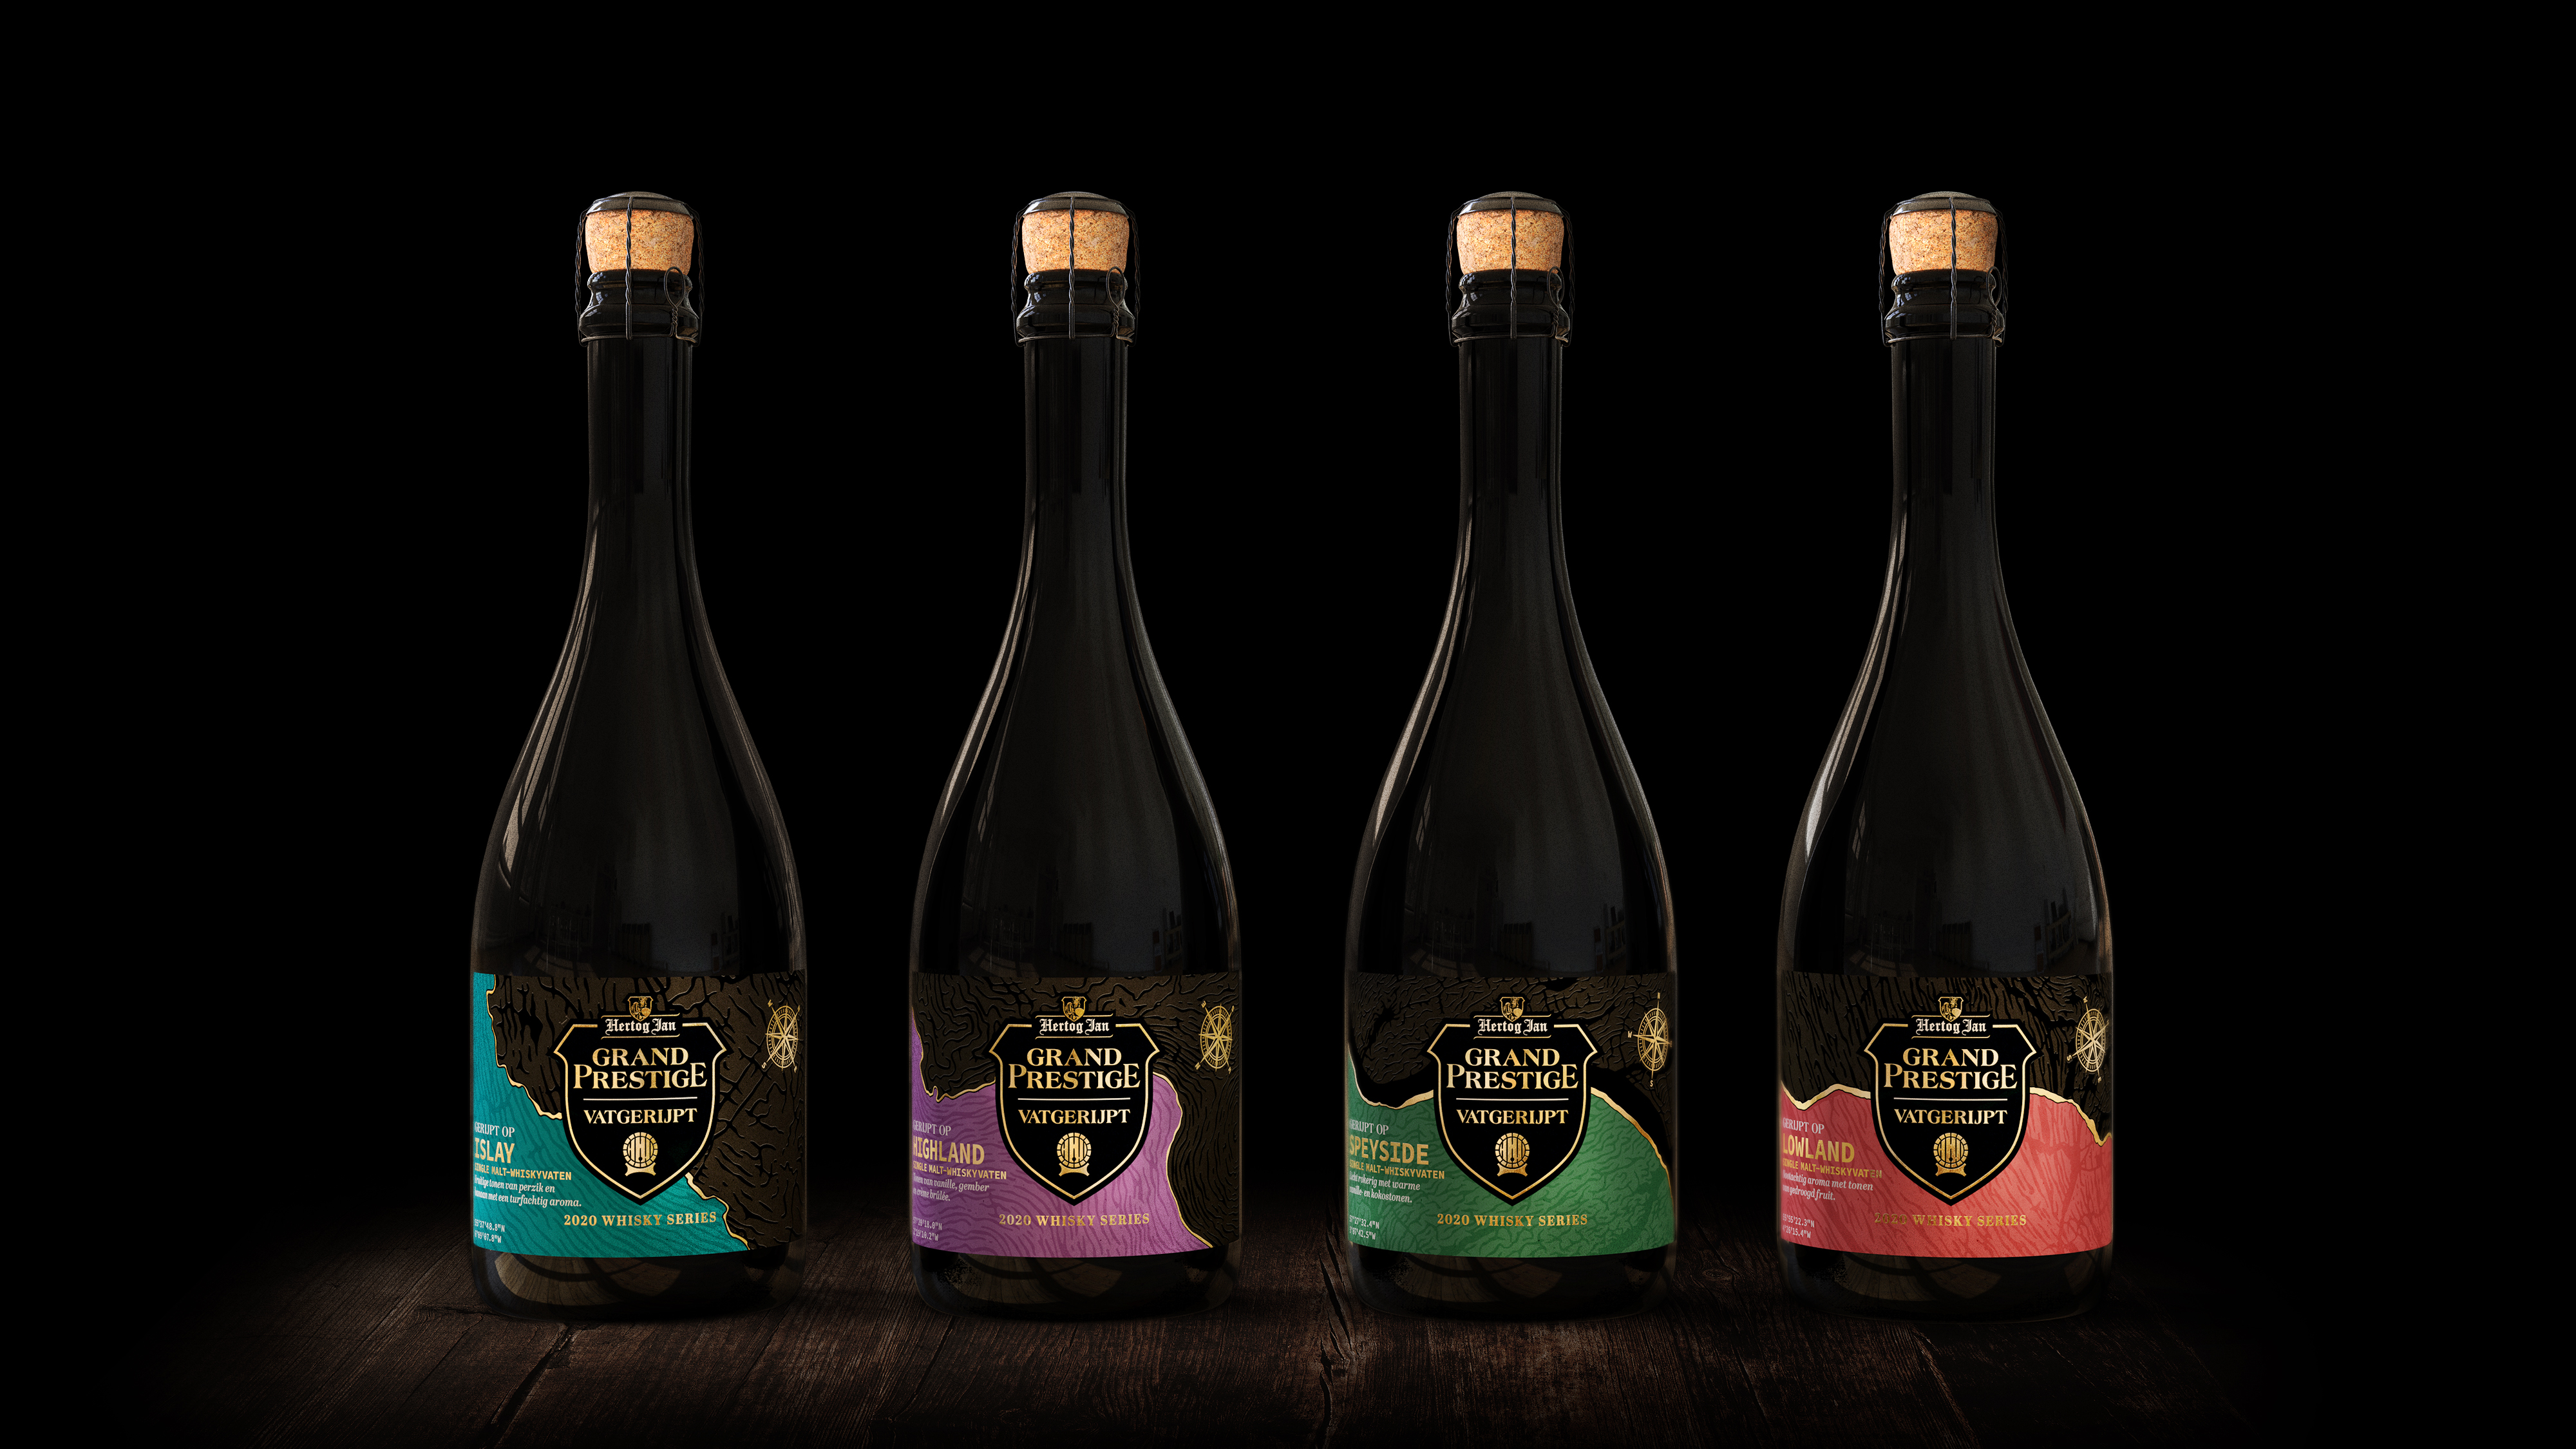 Beer bottle design Hertog Jan Grand Prestige Vatgerijpt range